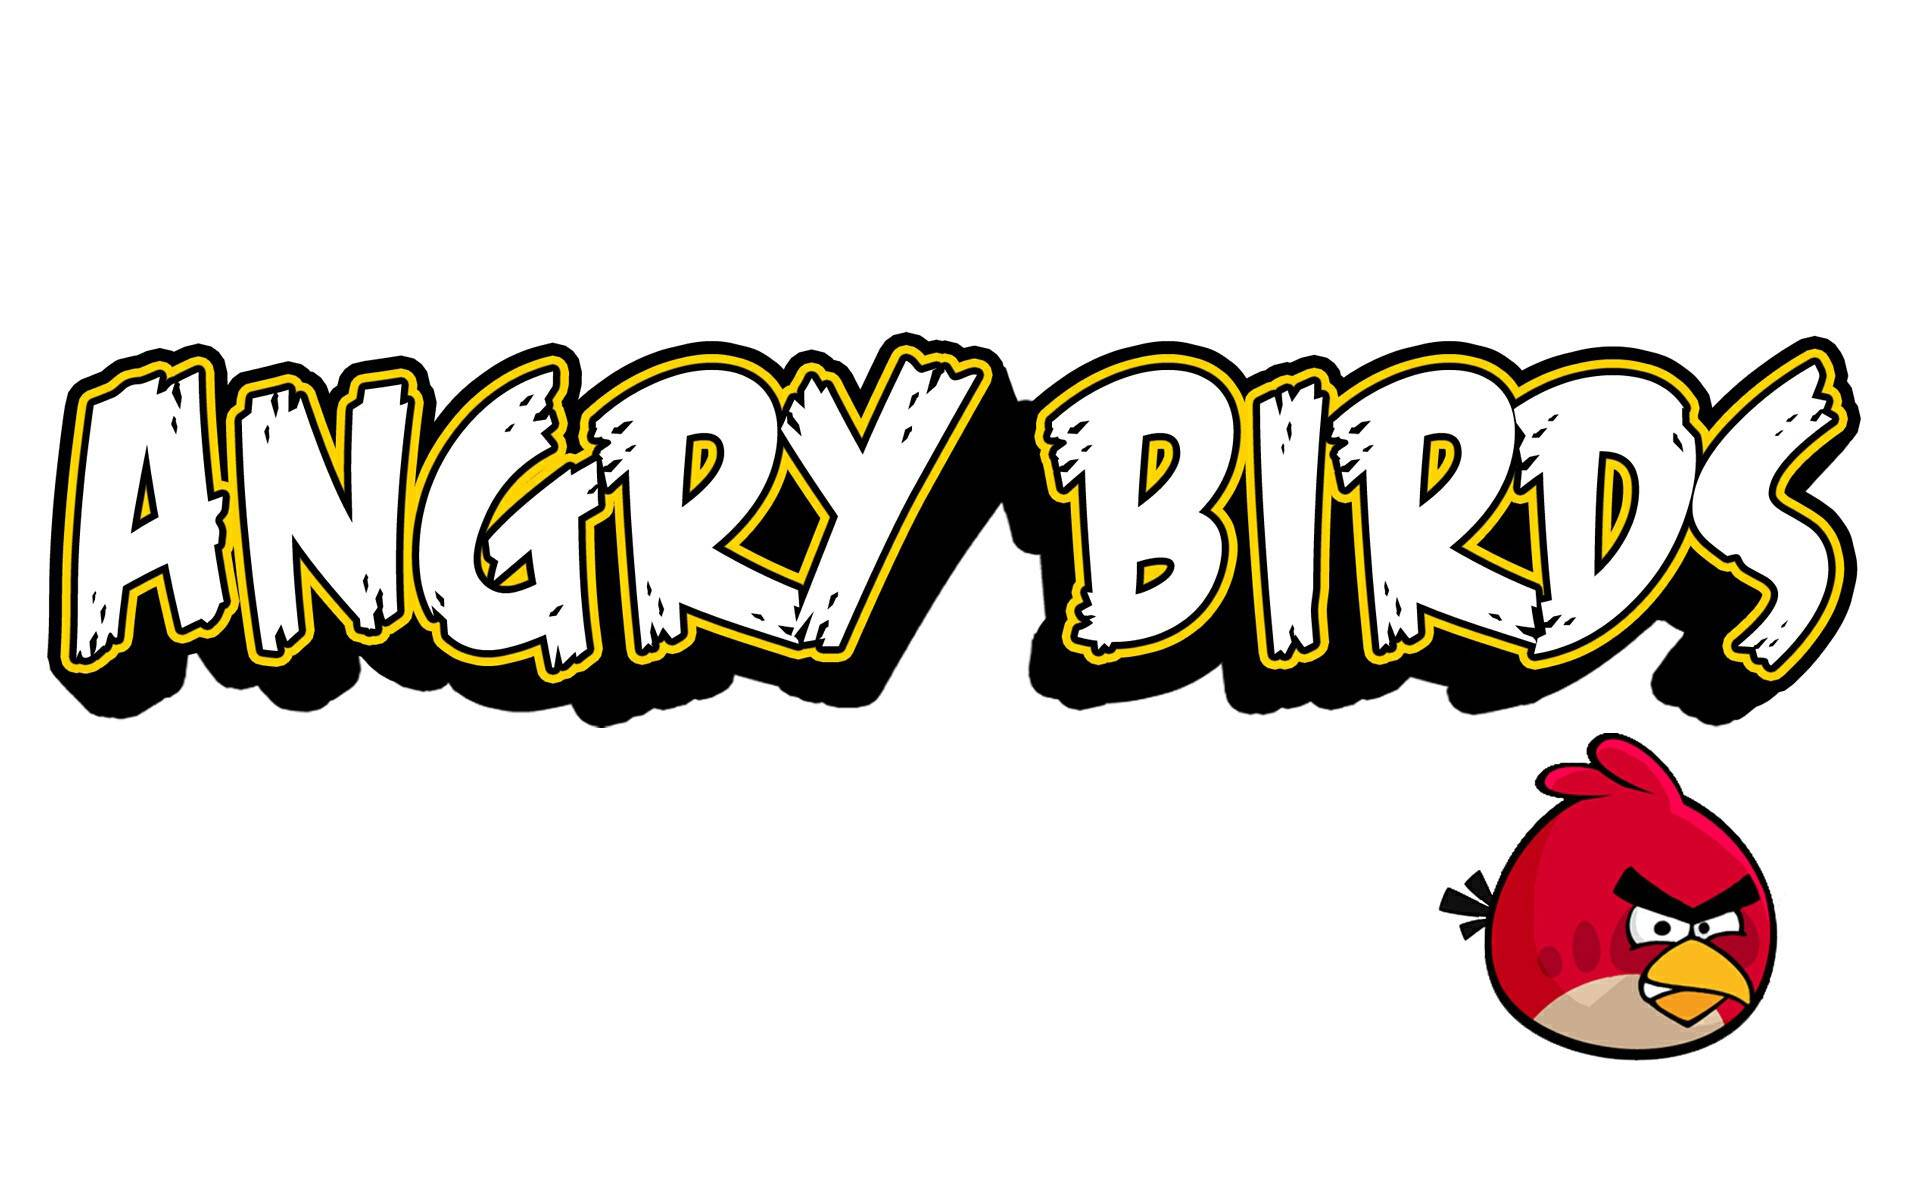 angry birds logo wallpaper 41413